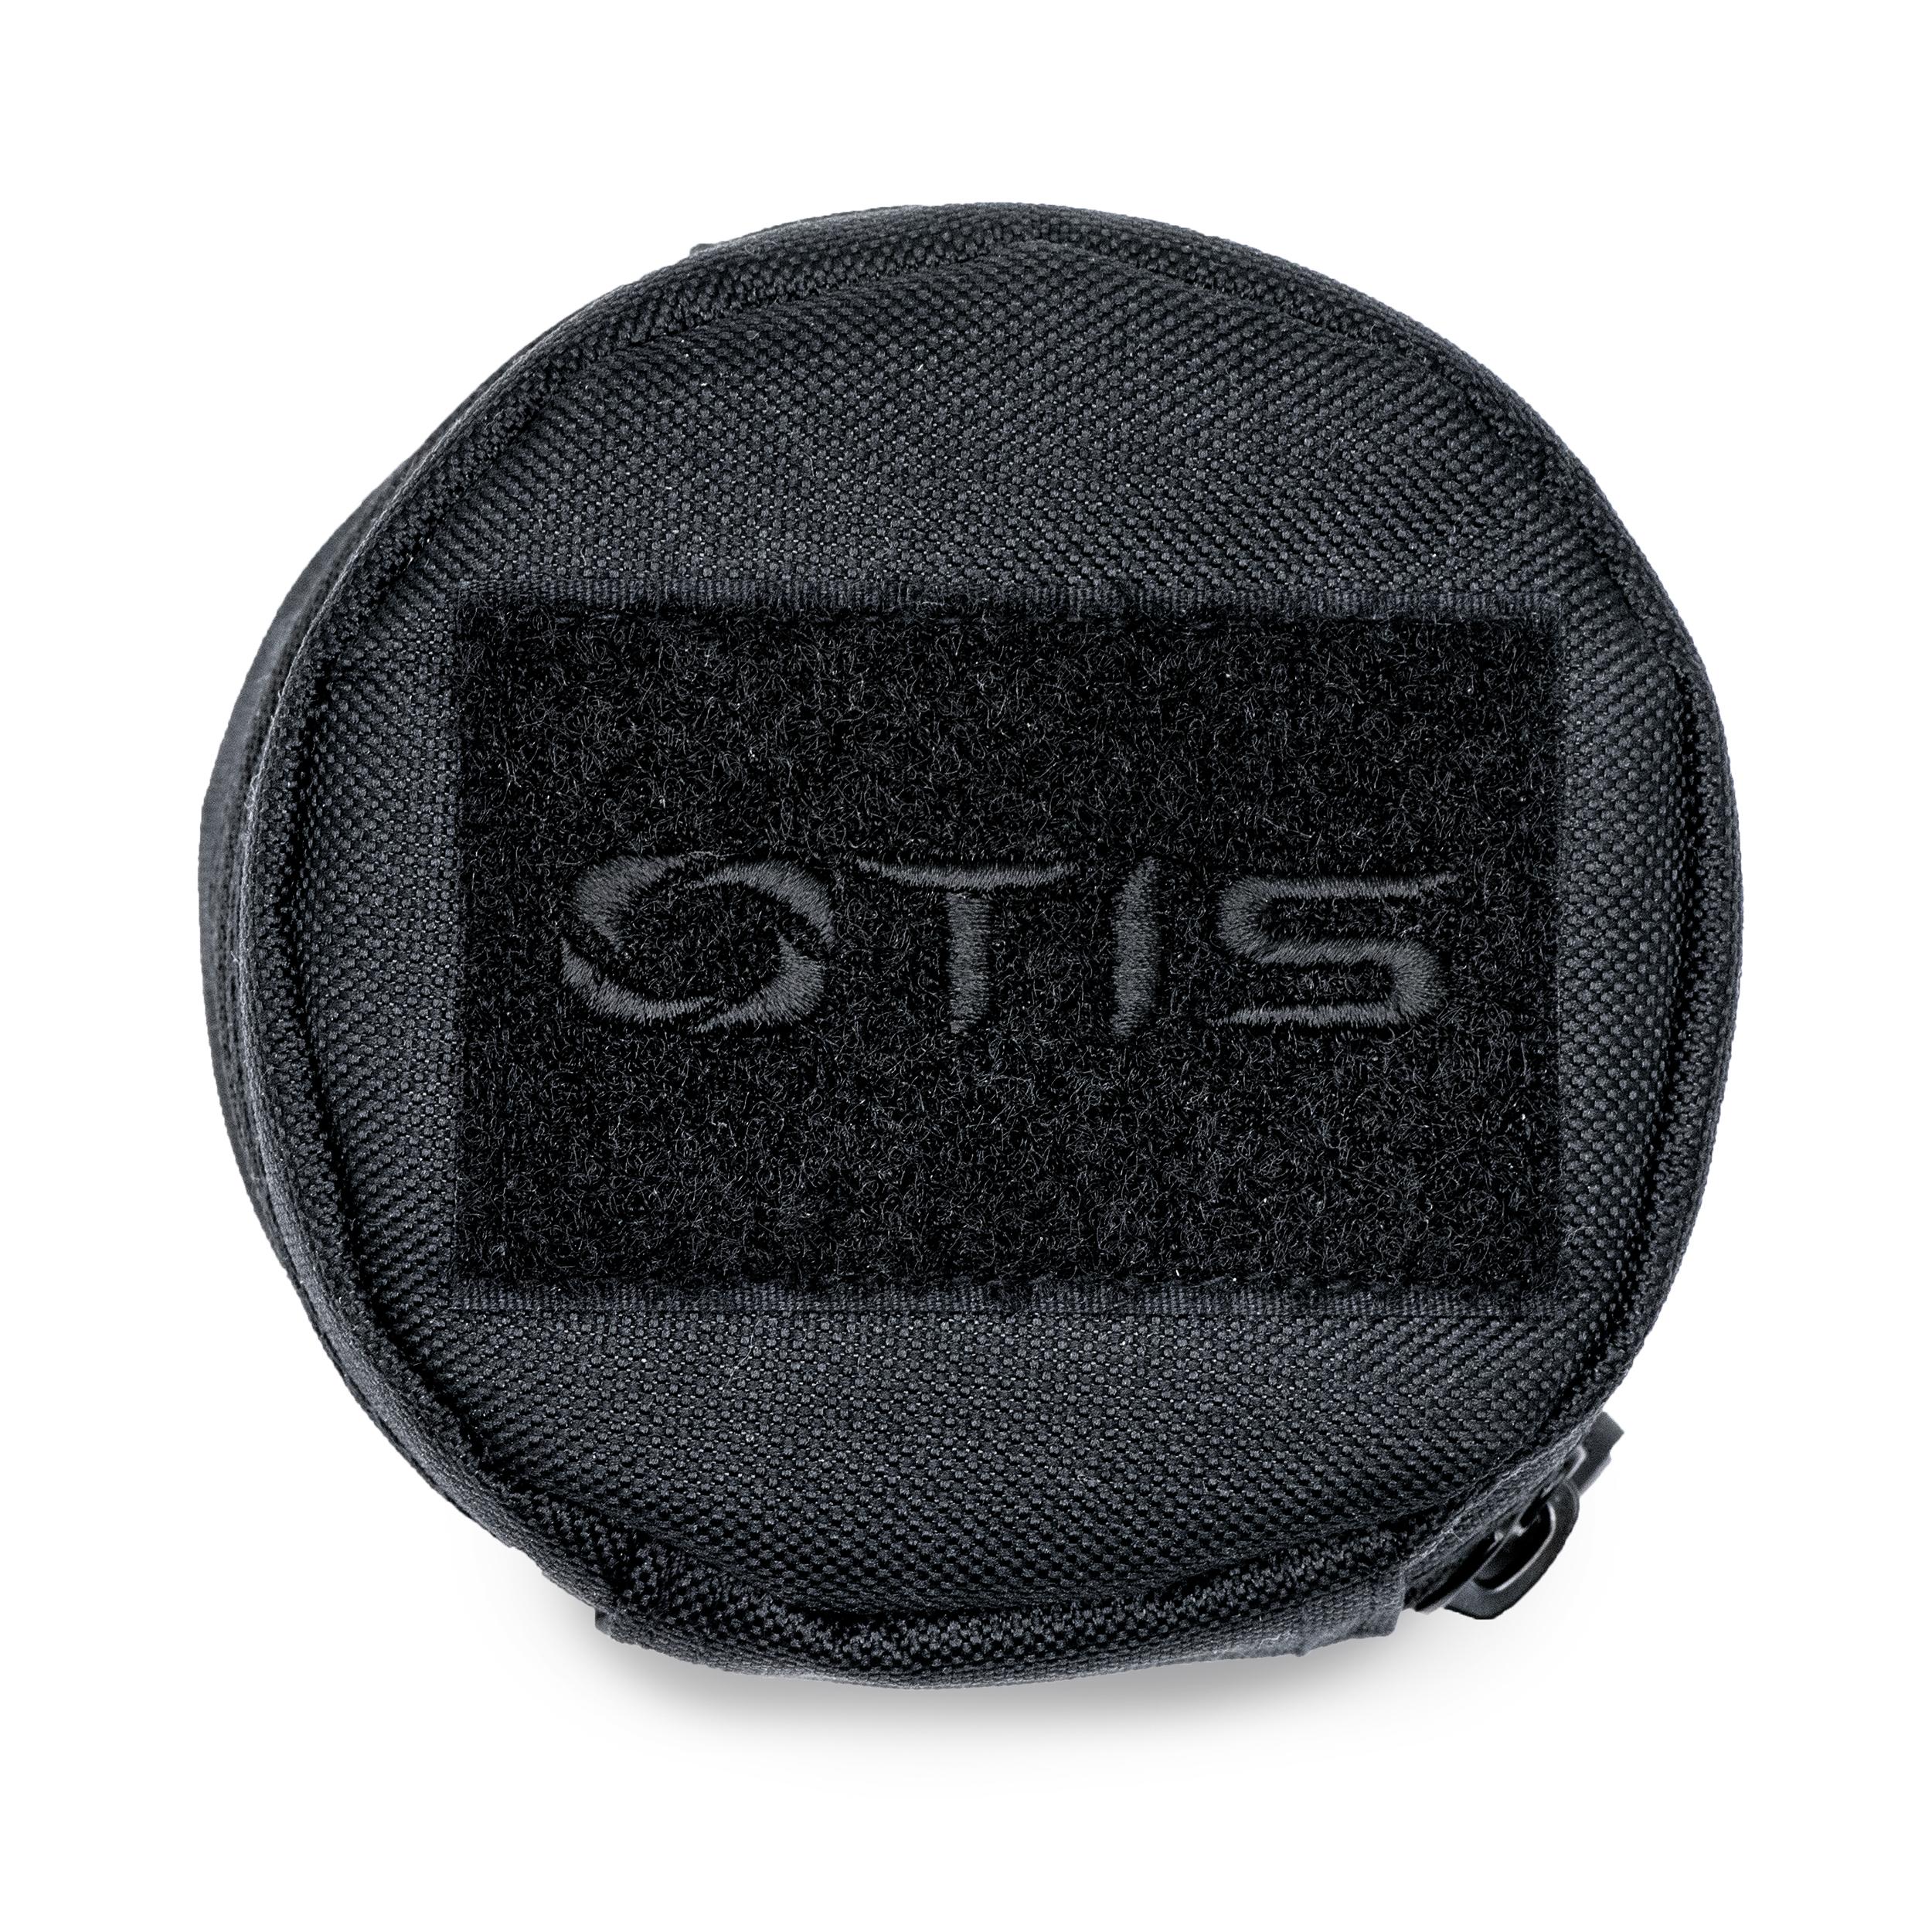 MSR/AR Cleaning Kit (.308/7.62MM)